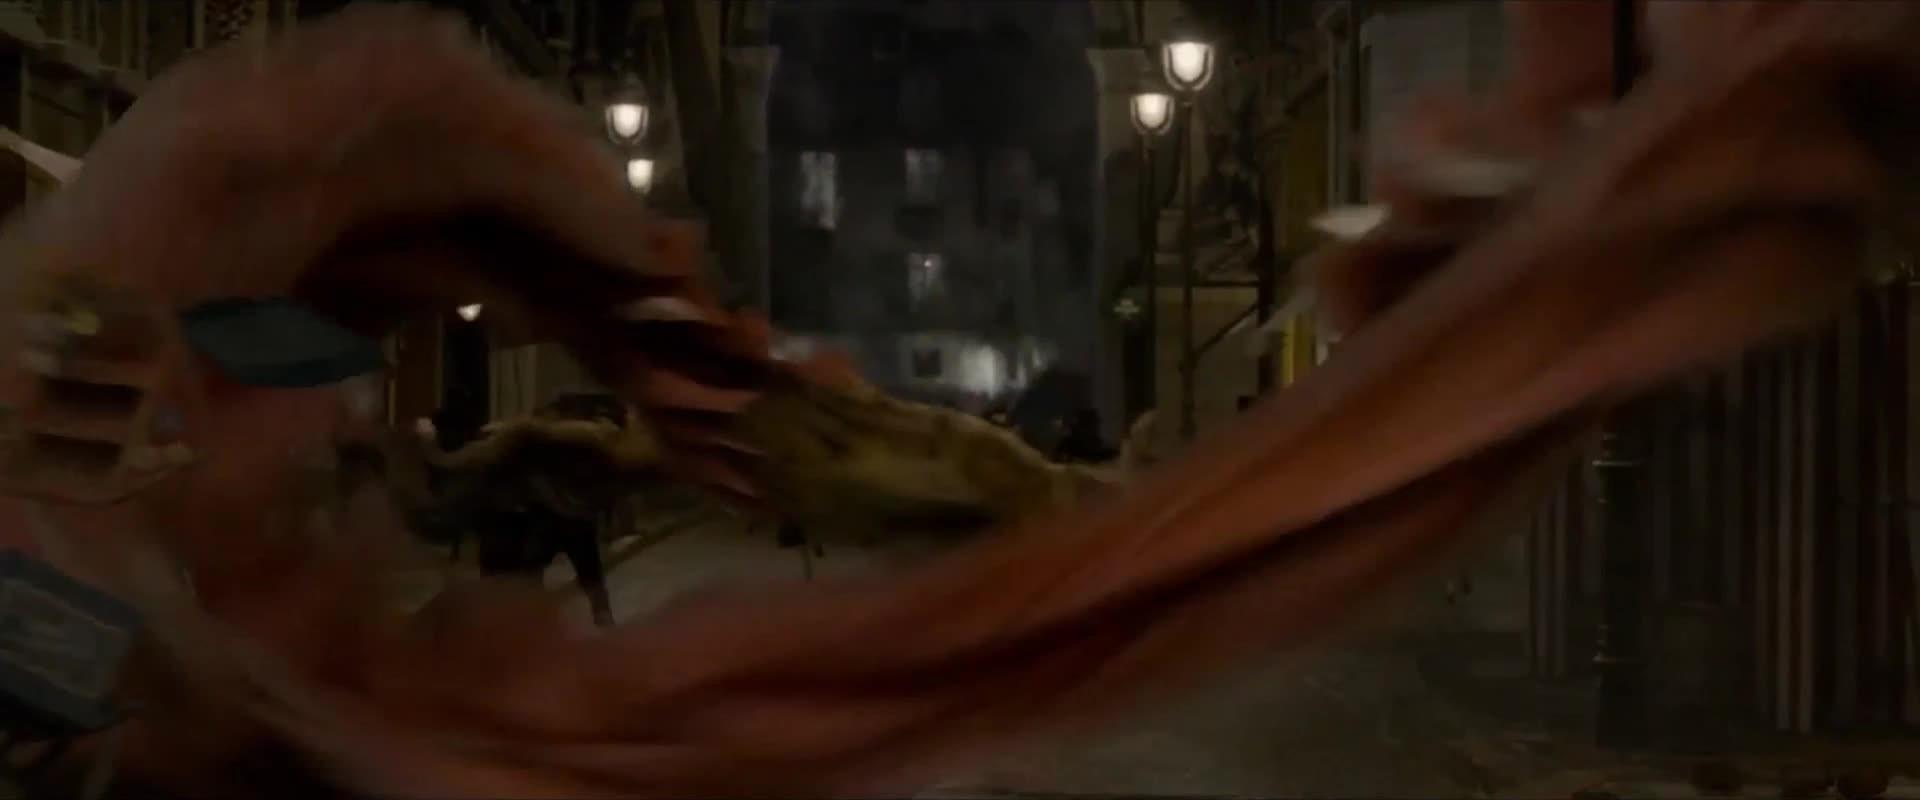 Fantastic.Beasts.The.Crimes.of.Grindelwald.2018.1080p.HC.HDRip تحميل تورنت فيلم 4 arabp2p.com